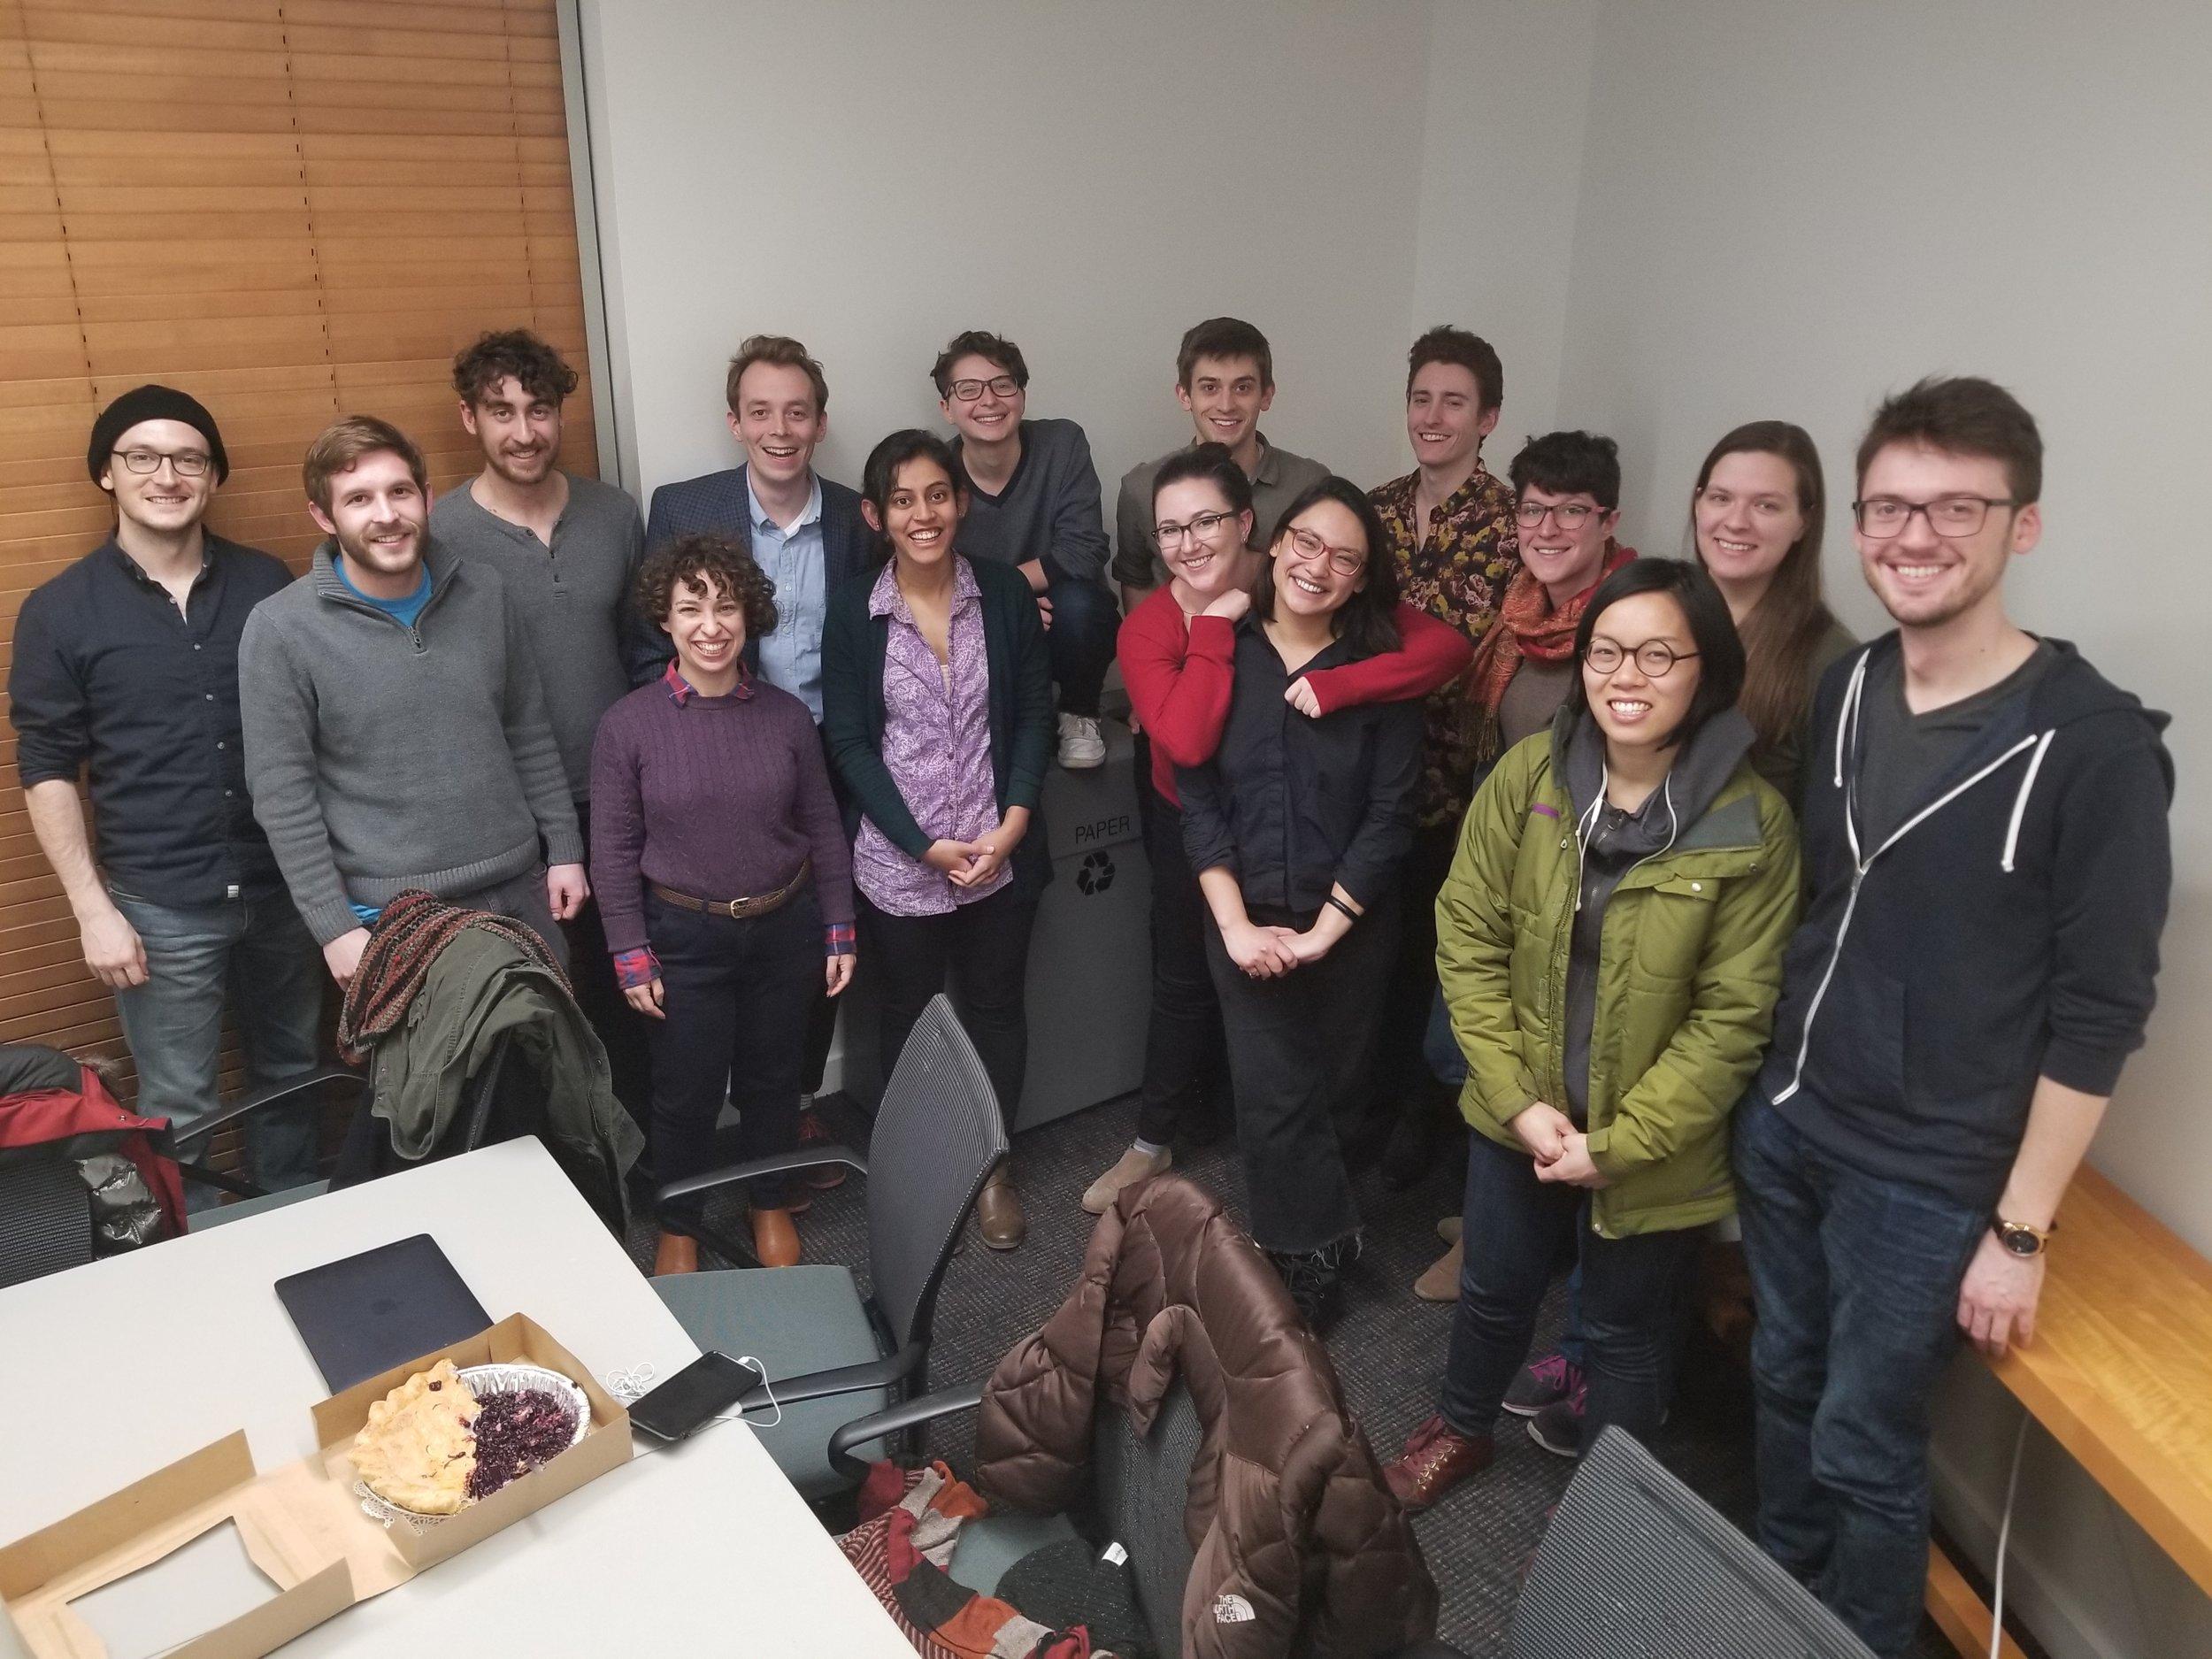 HGSU : Harvard Graduate Students Union